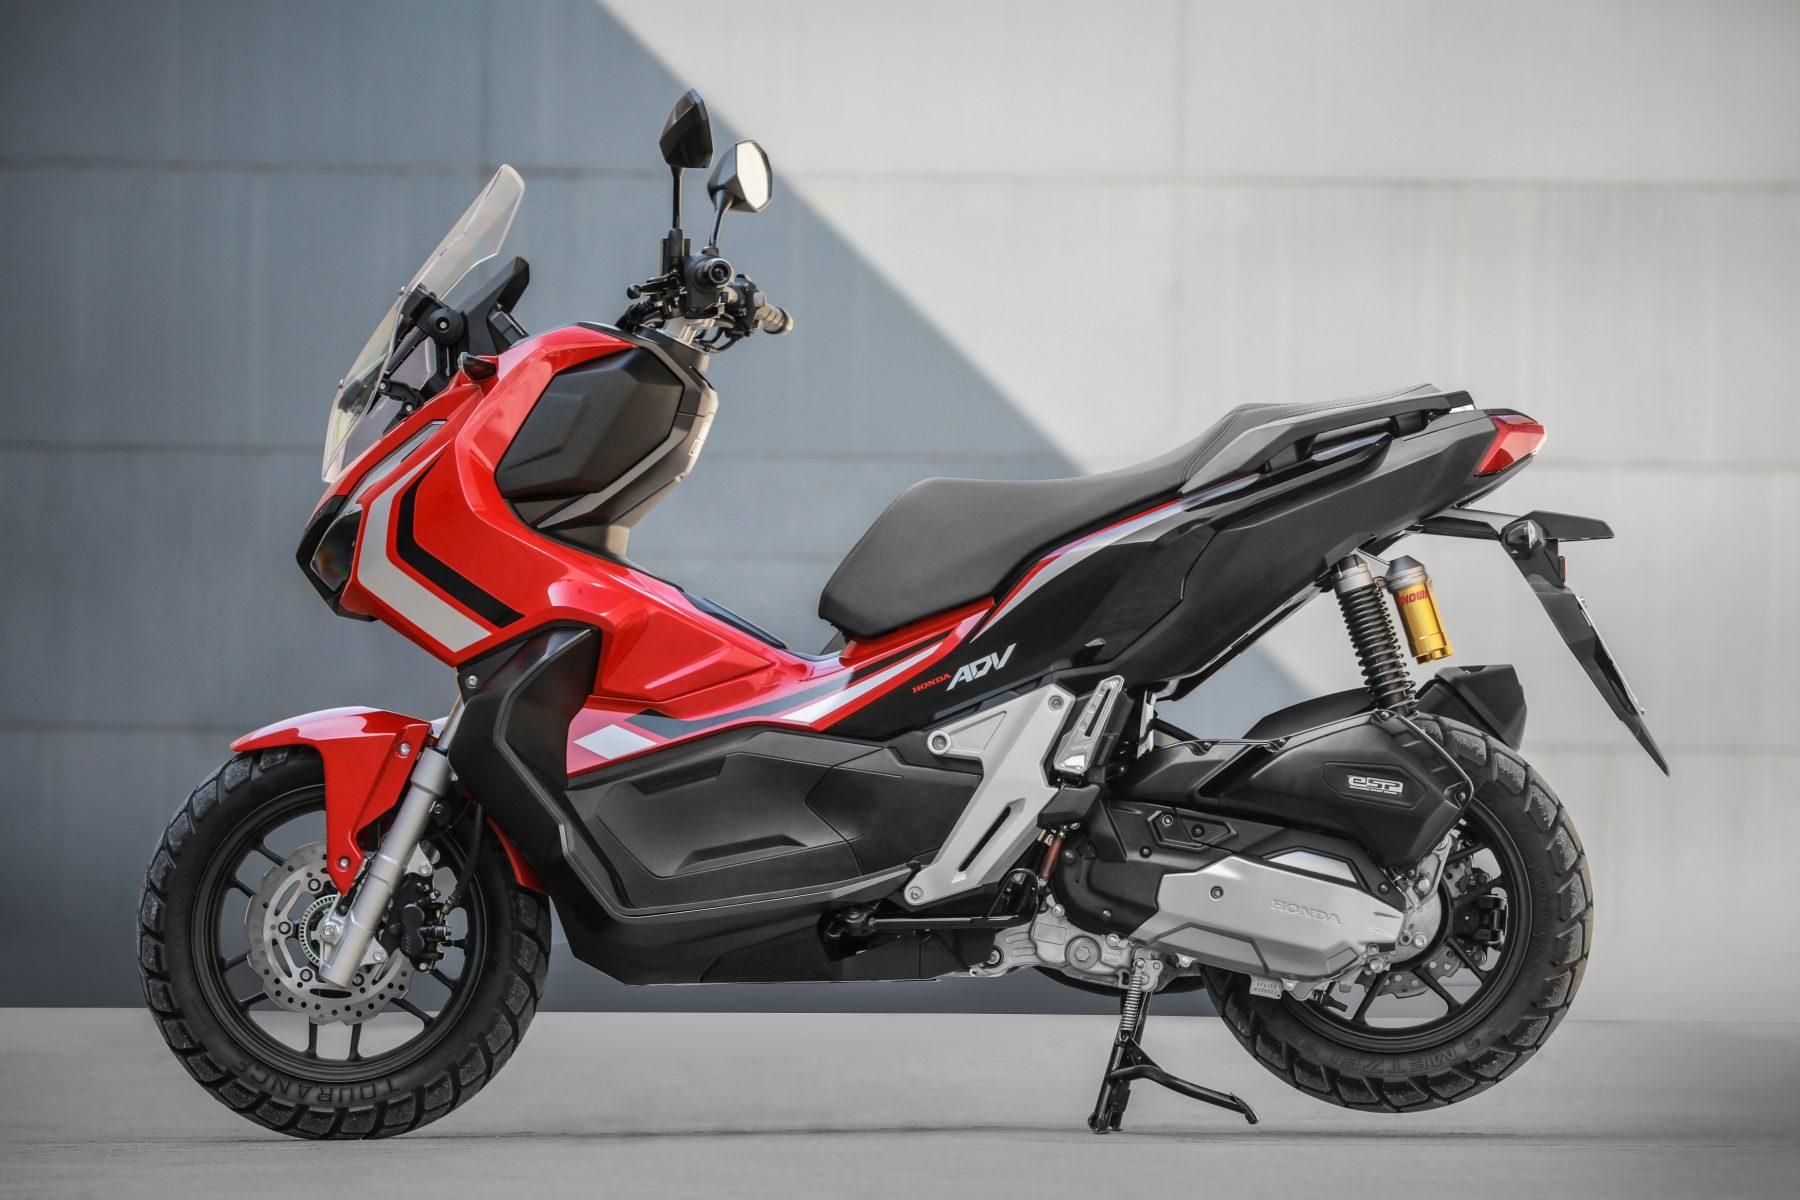 scooter honda adv 150 impressoes 6